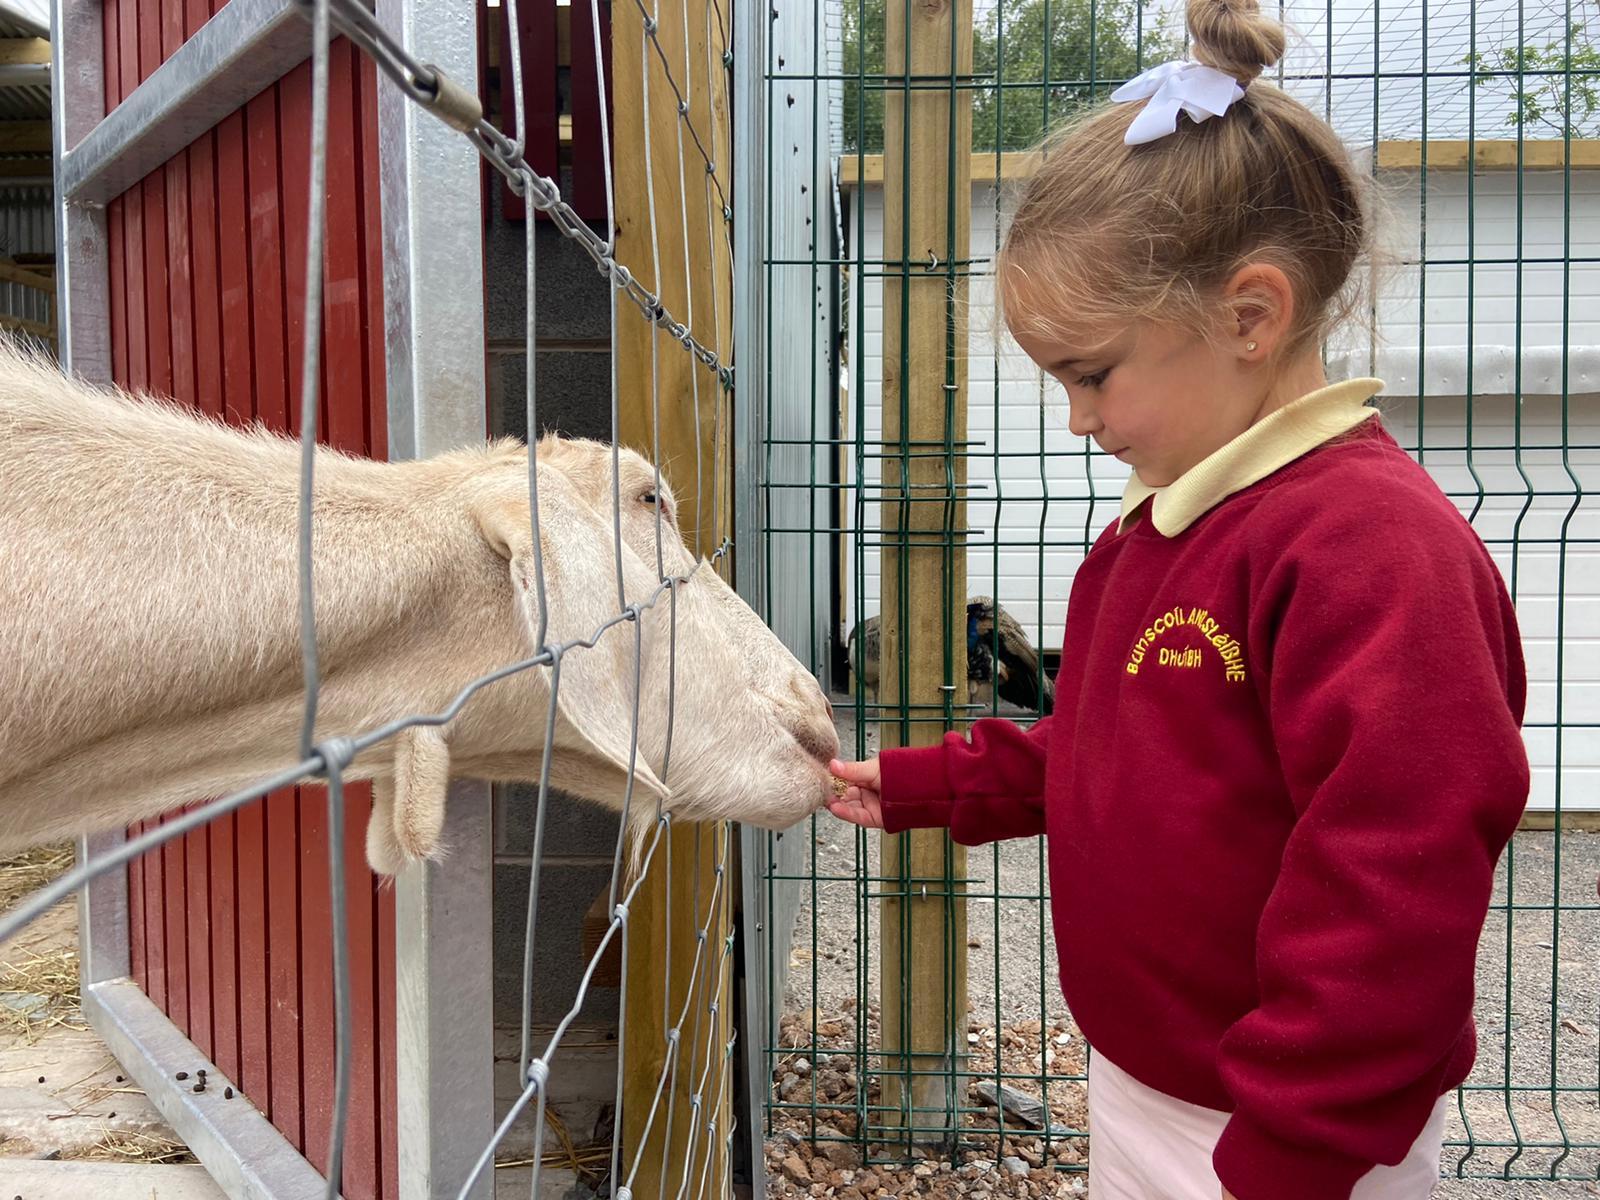 DOWN ON THE FARM: Little Connla Doherty feeding the goats at St James\' Community Farm